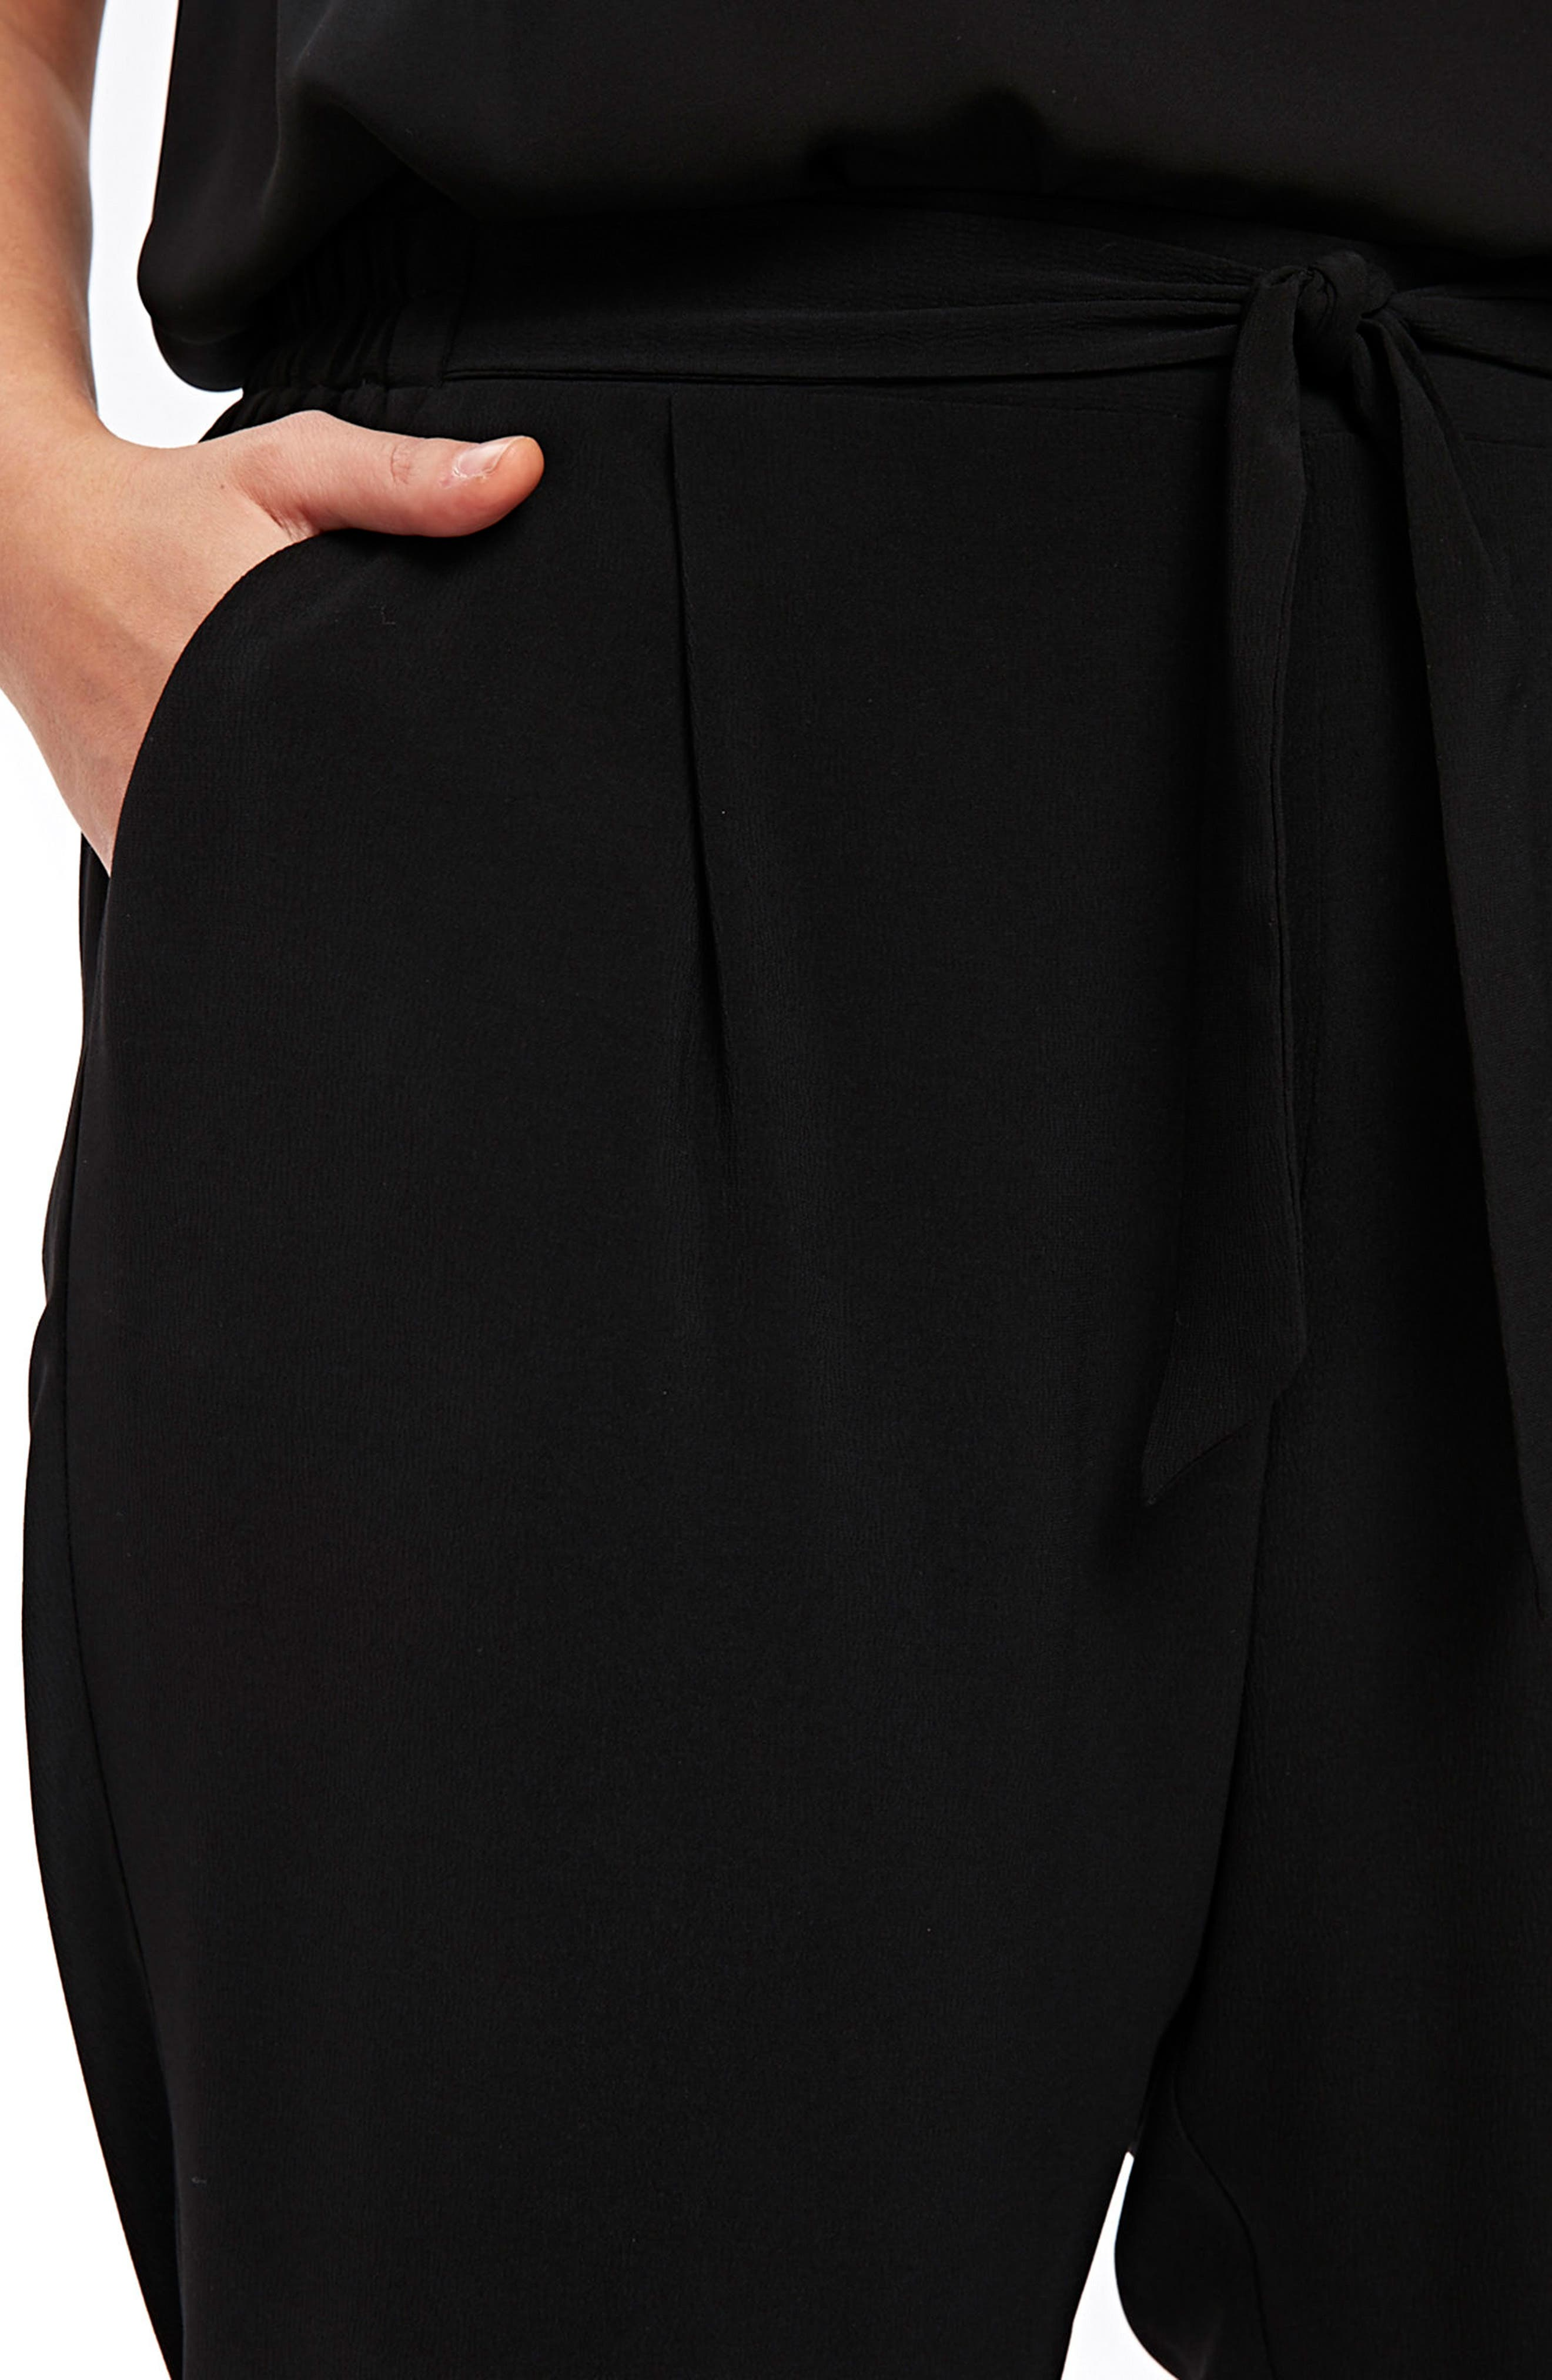 Ripple Tapered Pants,                             Alternate thumbnail 3, color,                             Black